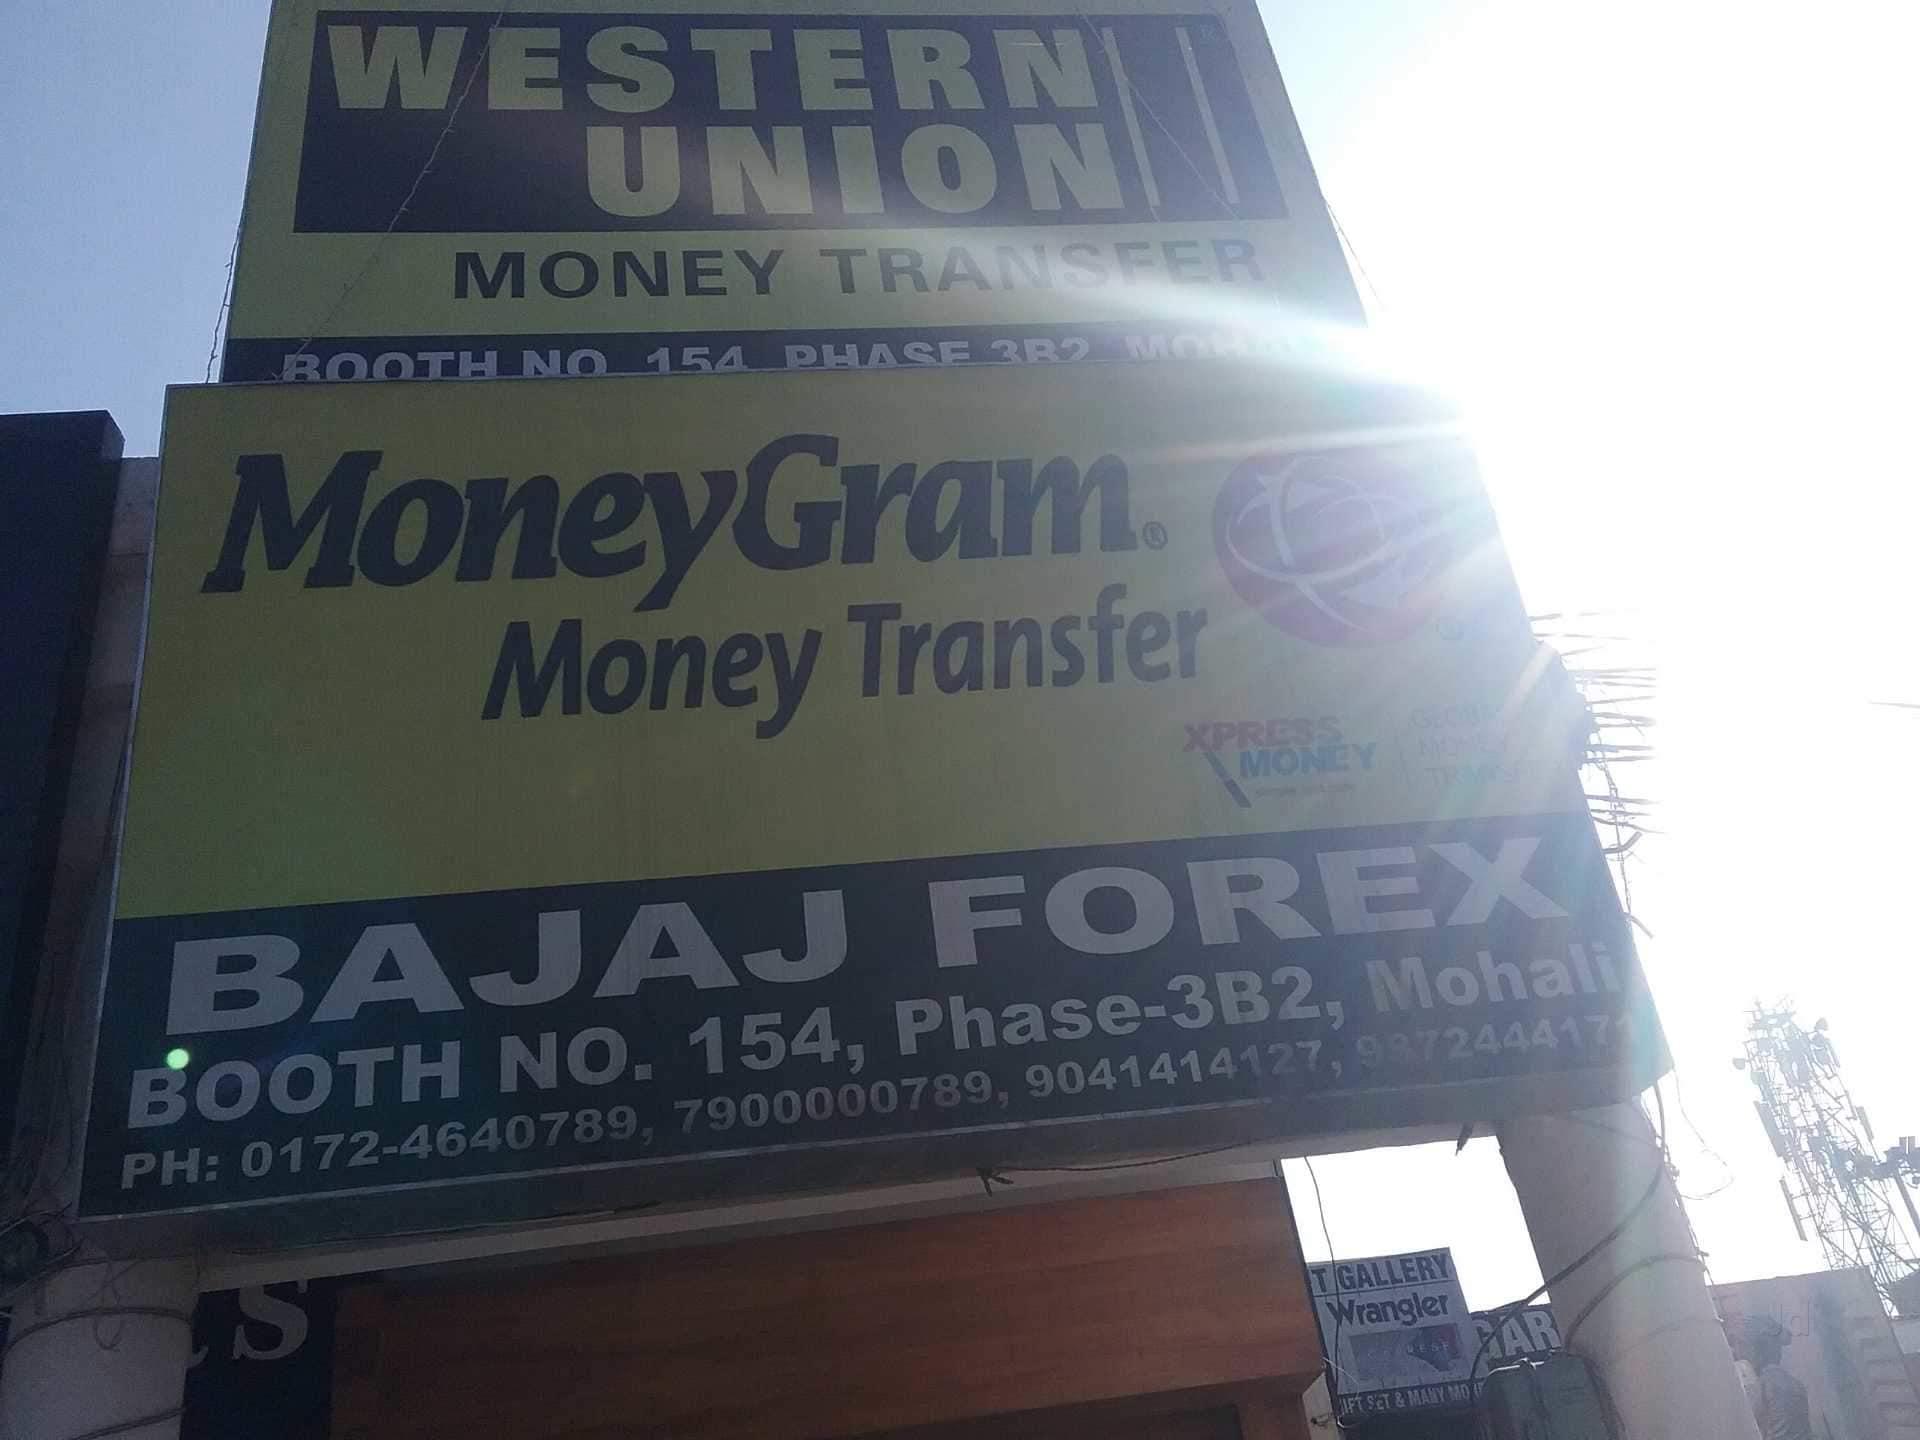 Western Union 24 Hours Money Transfer Agencies In Mohali Sas Nagar Chandigarh